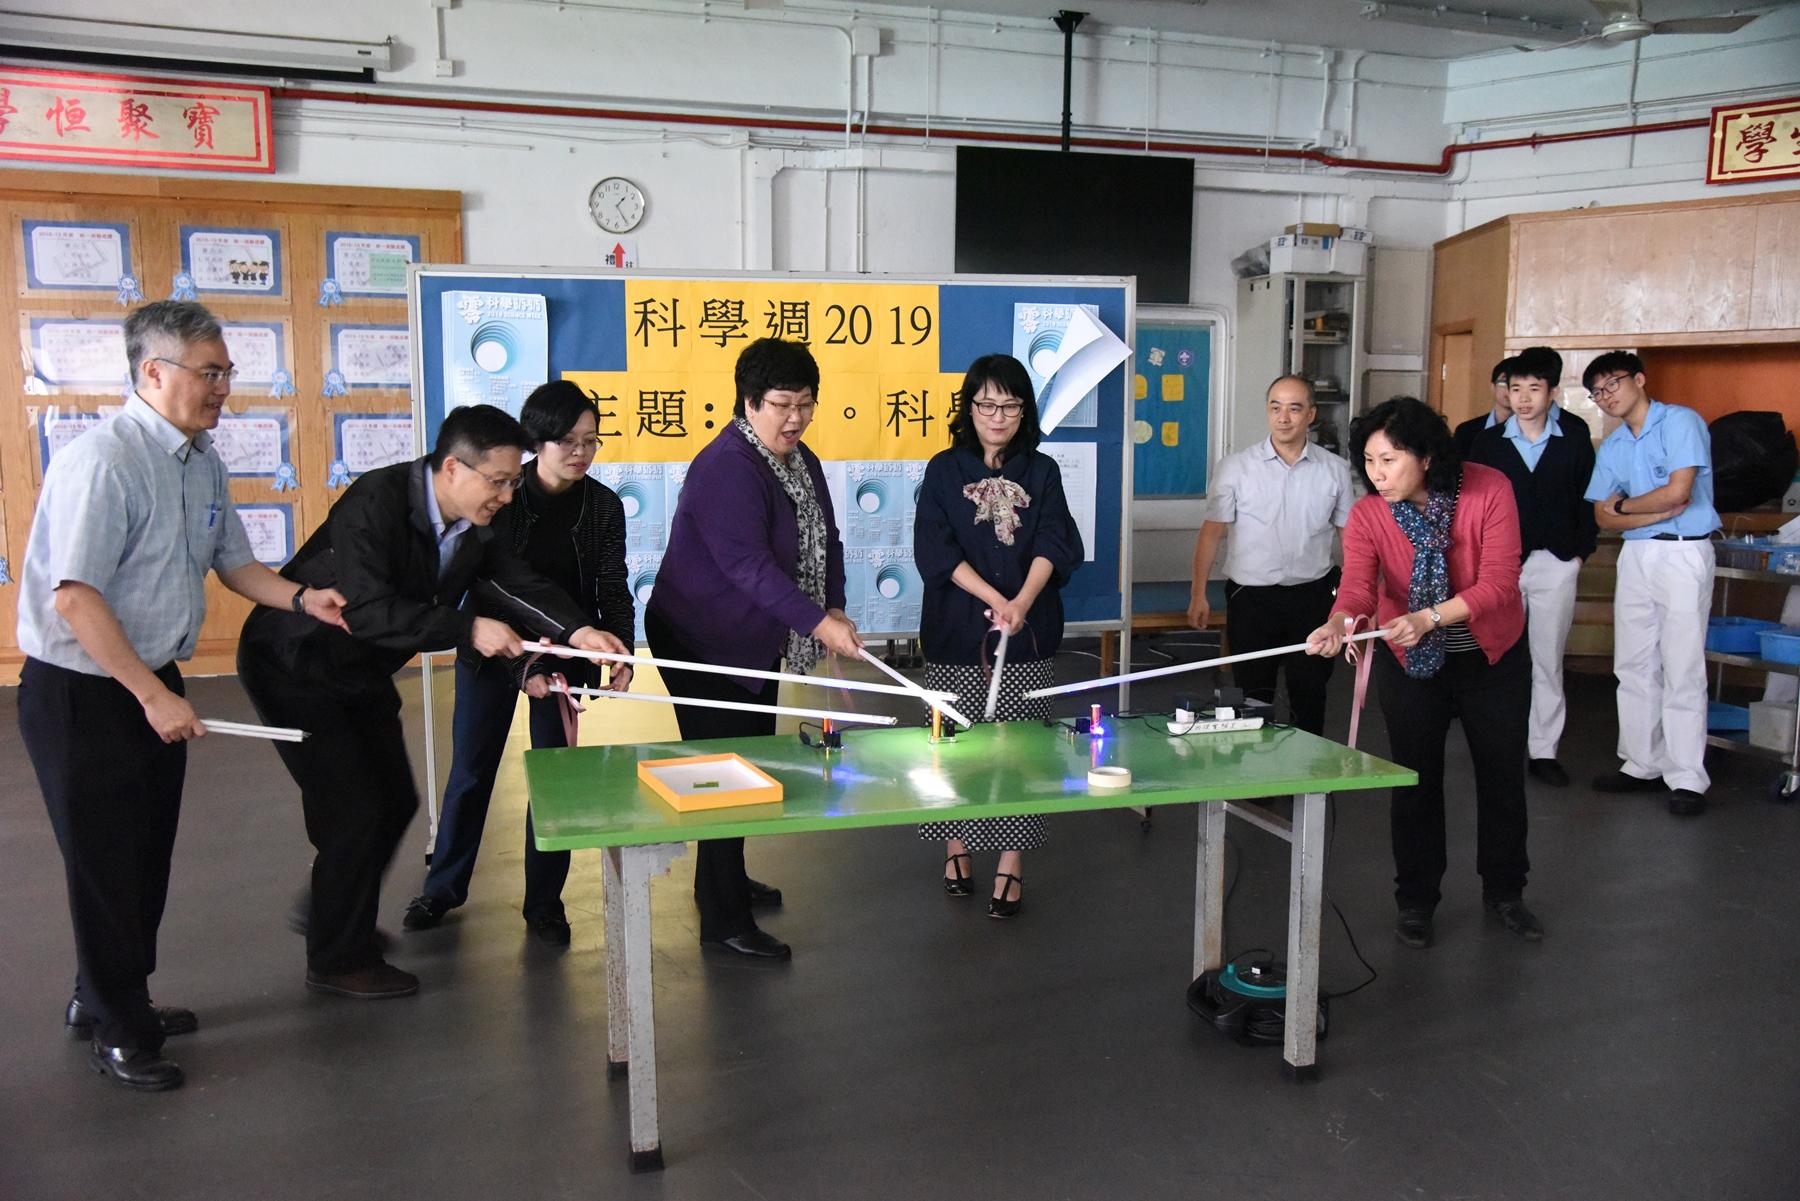 http://npc.edu.hk/sites/default/files/dsc_9371.jpg